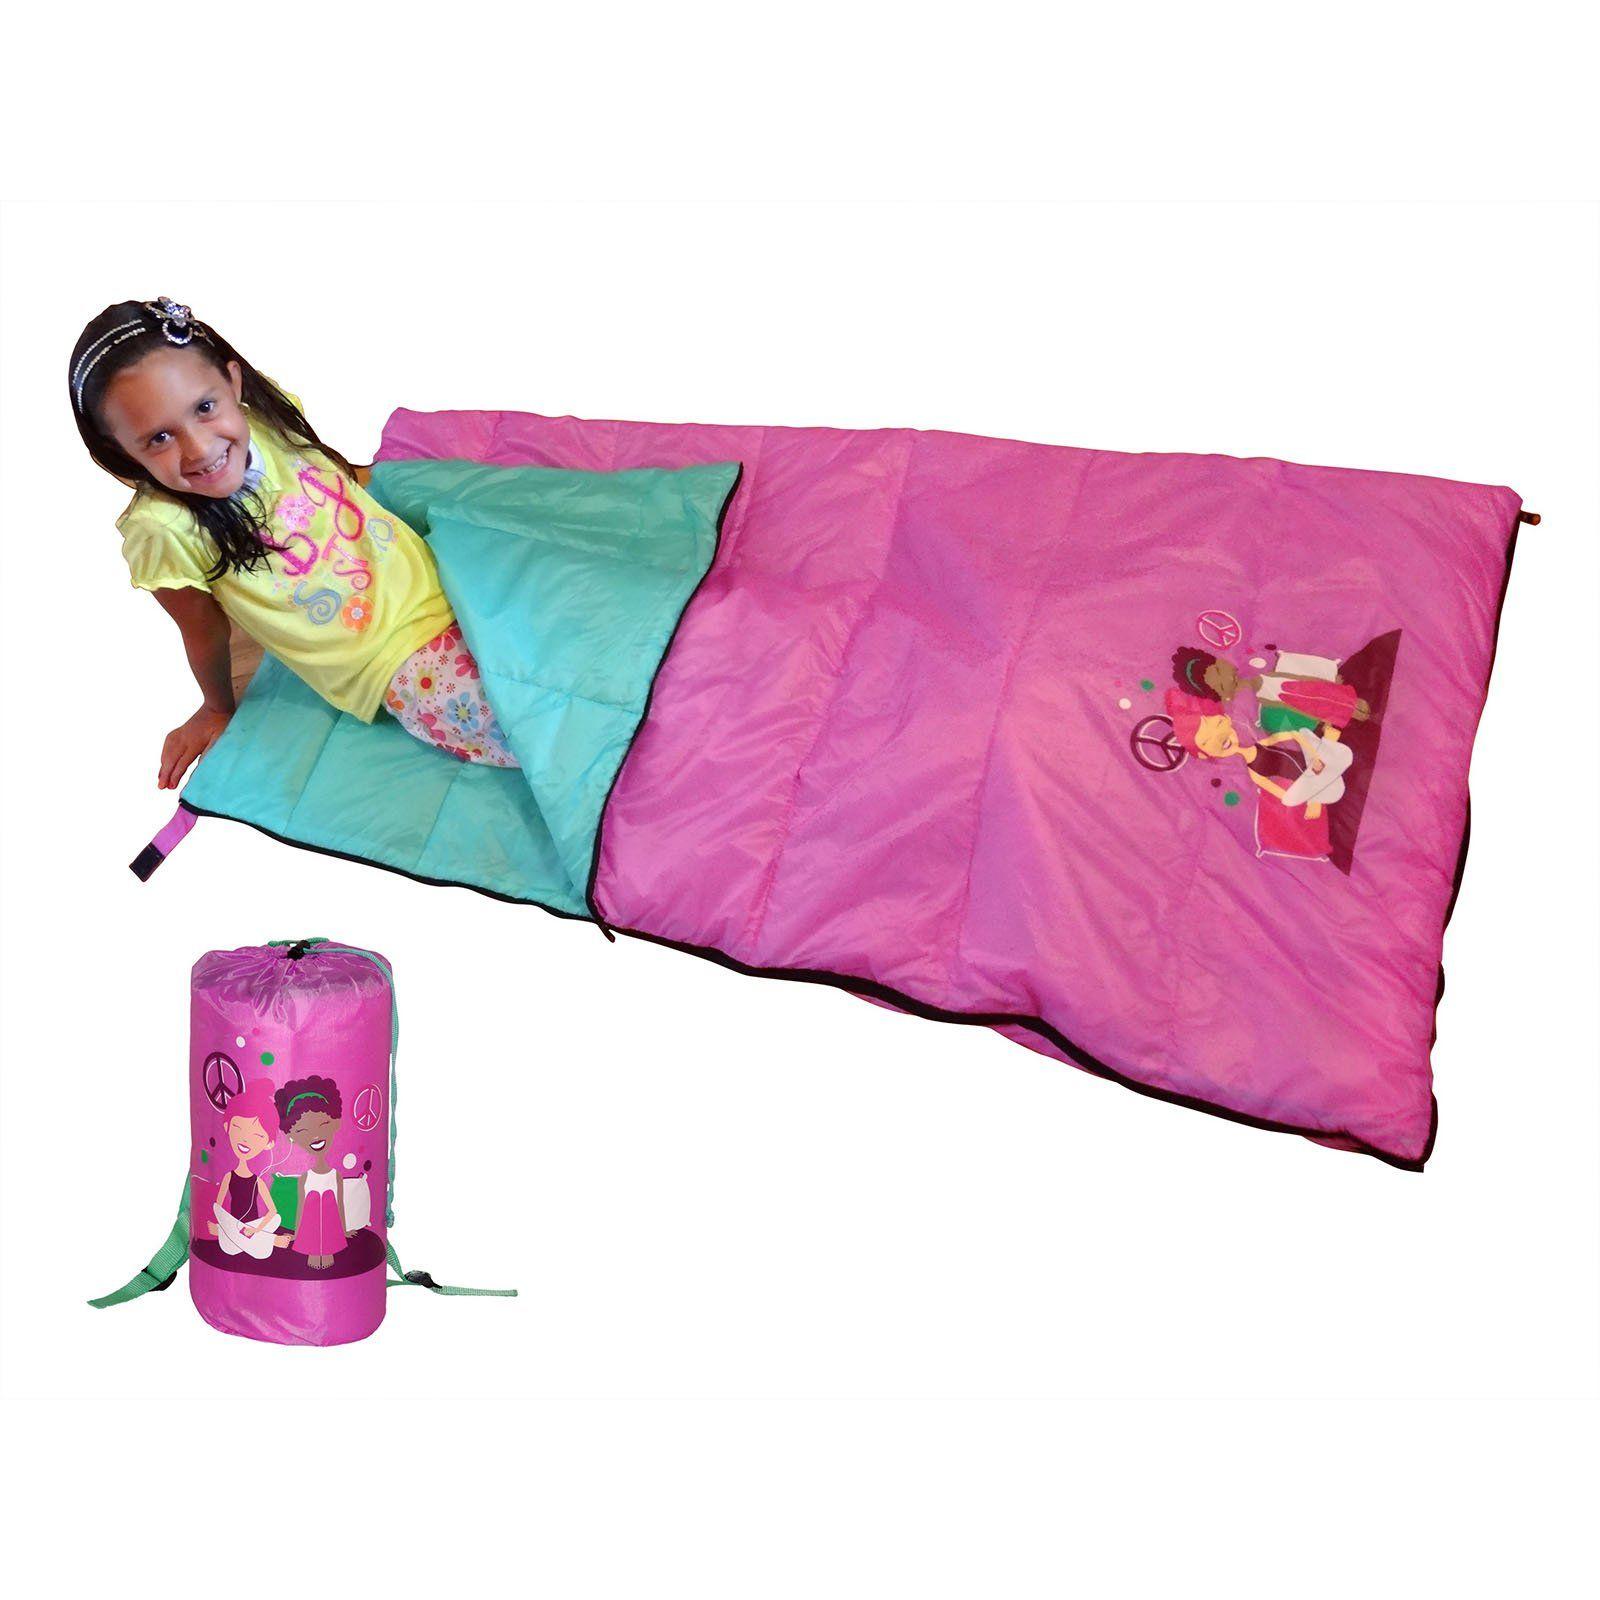 f08f732e0ba Gigatent Slumber Girl Sleeping Bag in 2019   Products   Kids ...